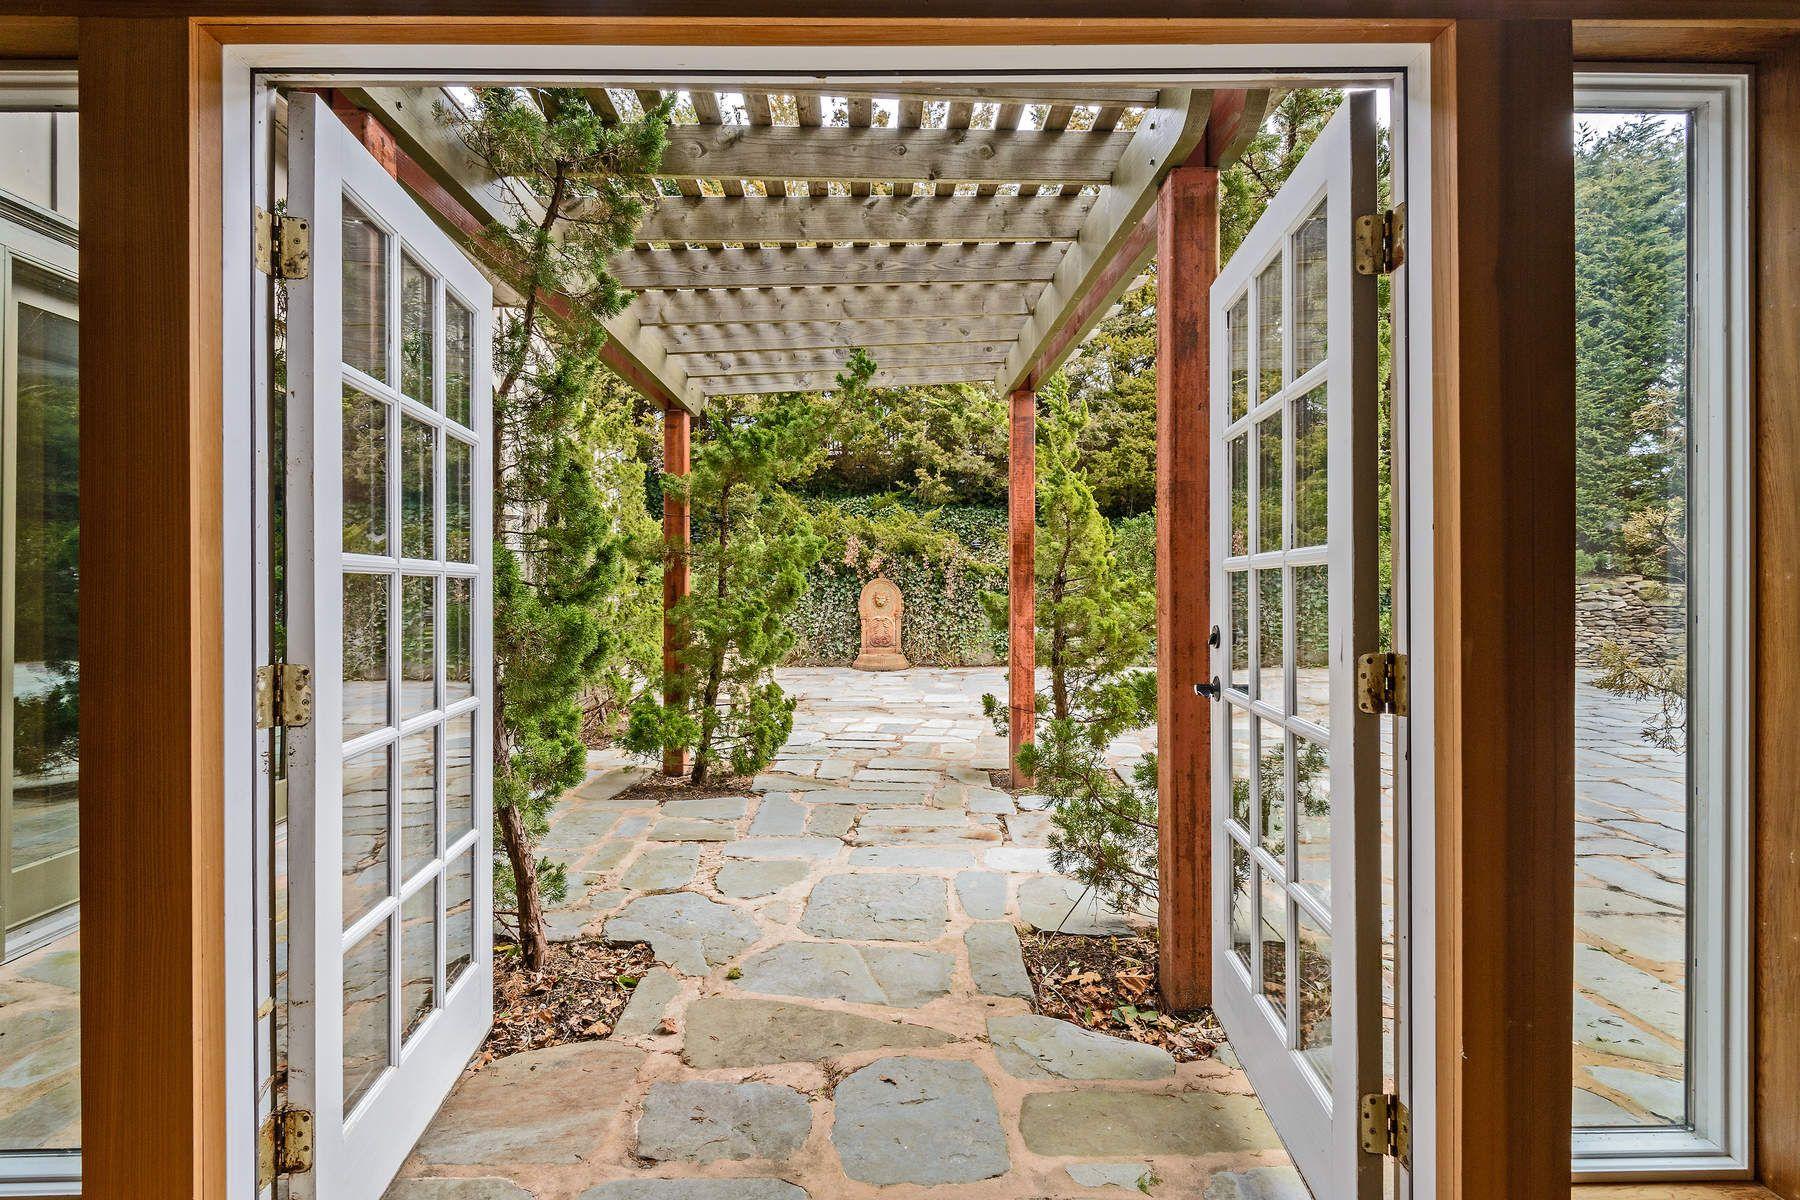 Additional photo for property listing at POST MODERN BARN, INFINITY POOL  Sagaponack, New York 11962 United States